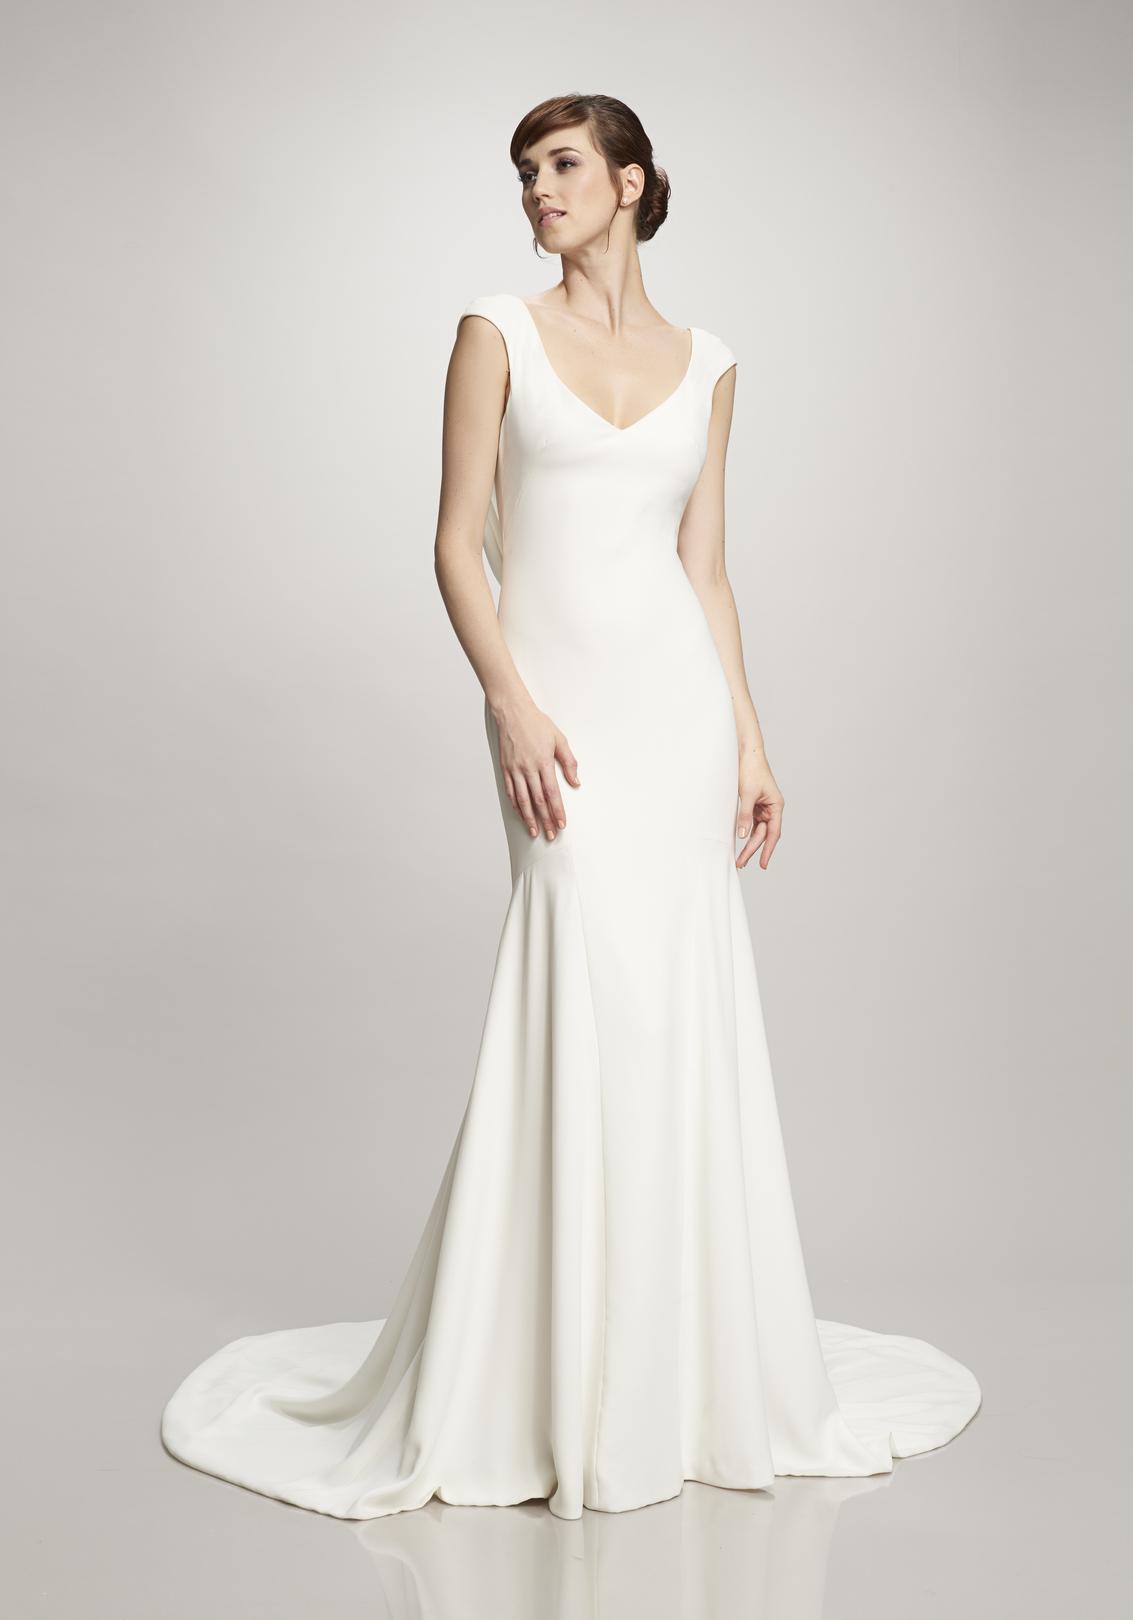 Dress main 2x 1547043613